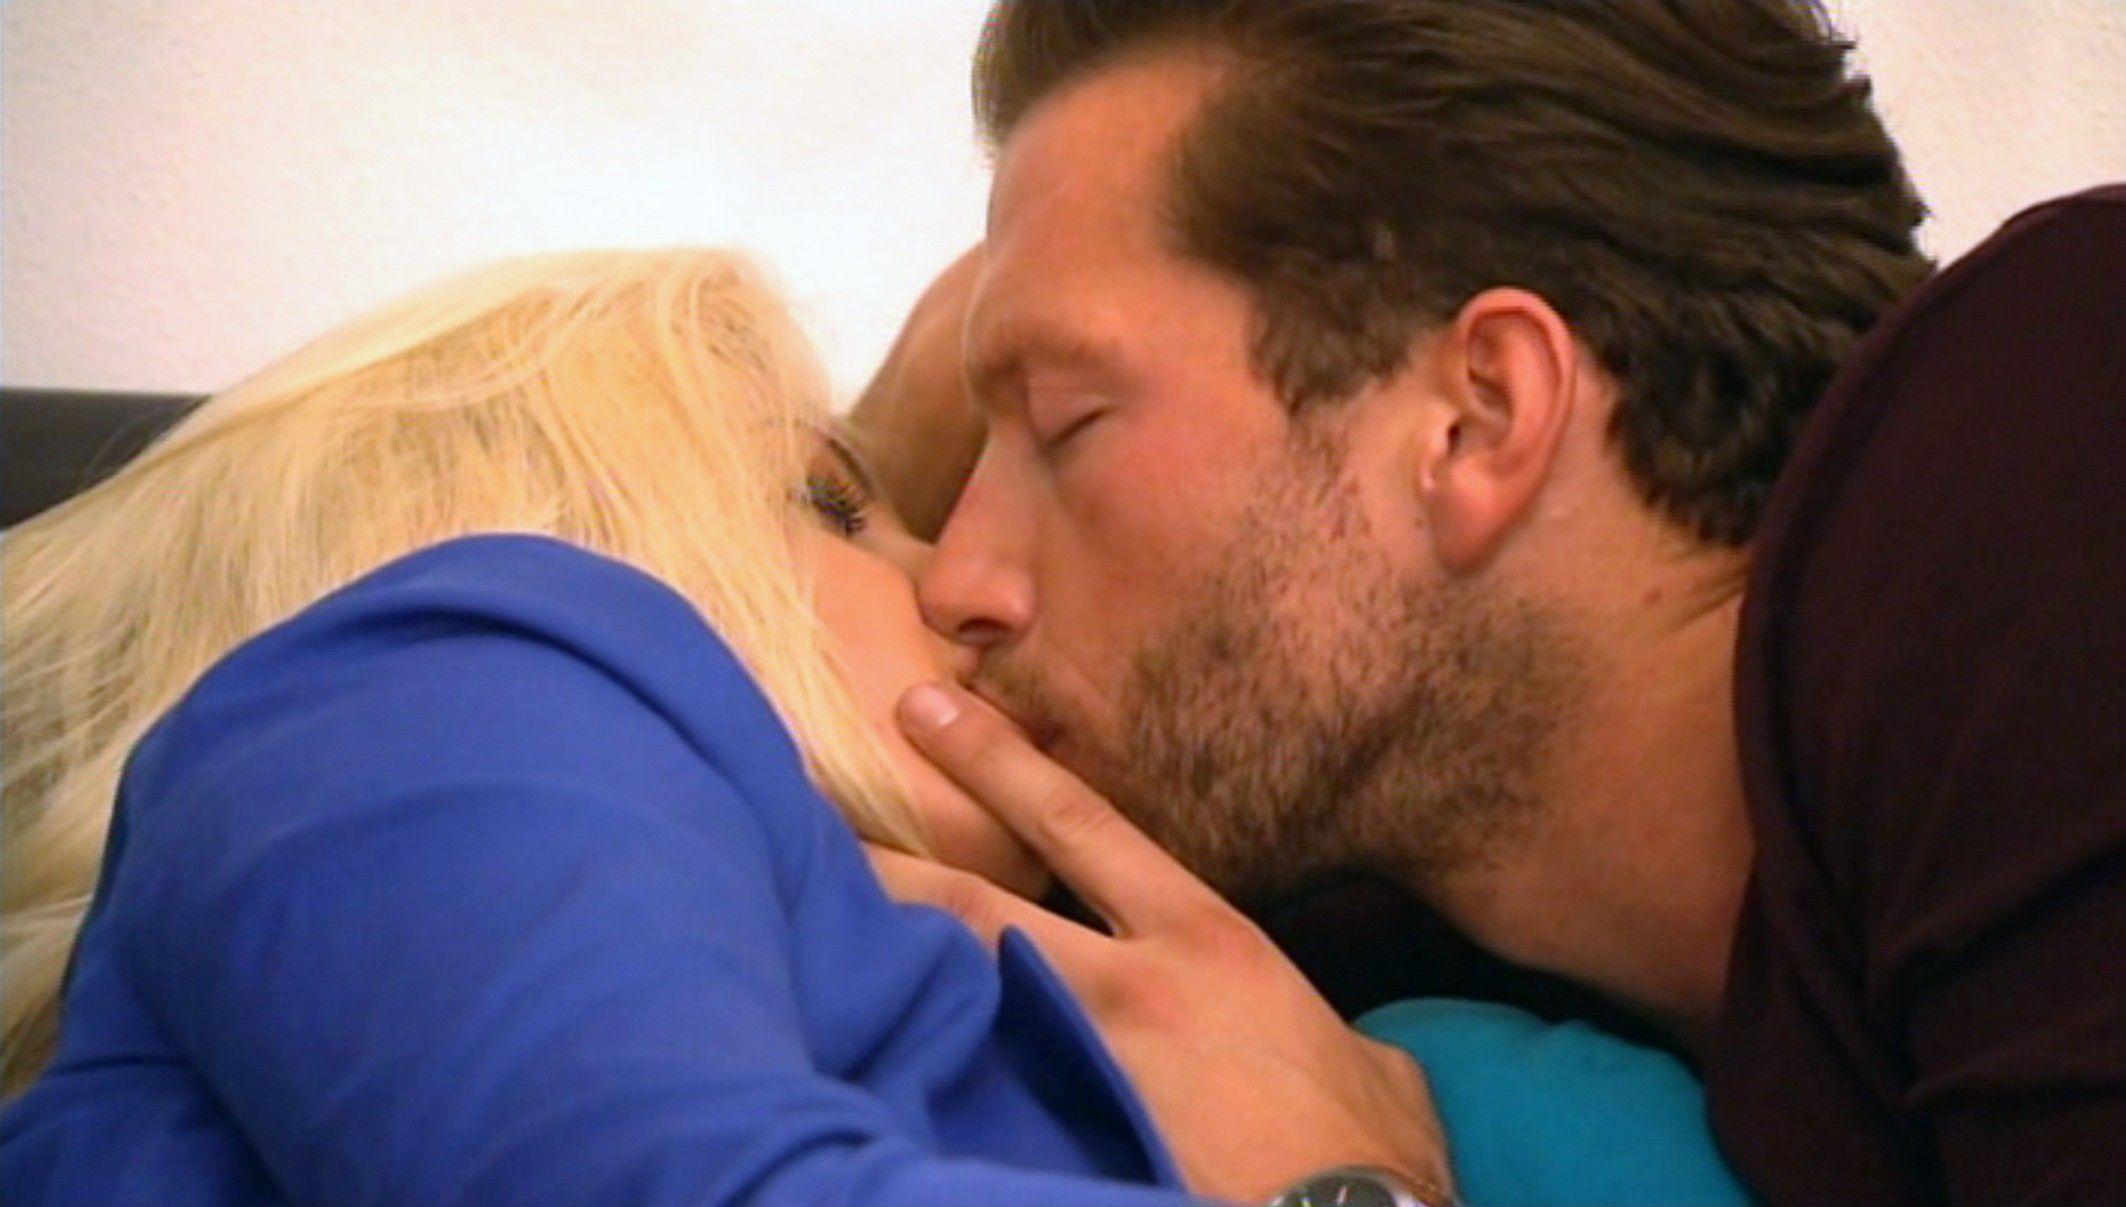 Der Bachelor 2015 Folge 6 - Oliver und Sarah küssen sich